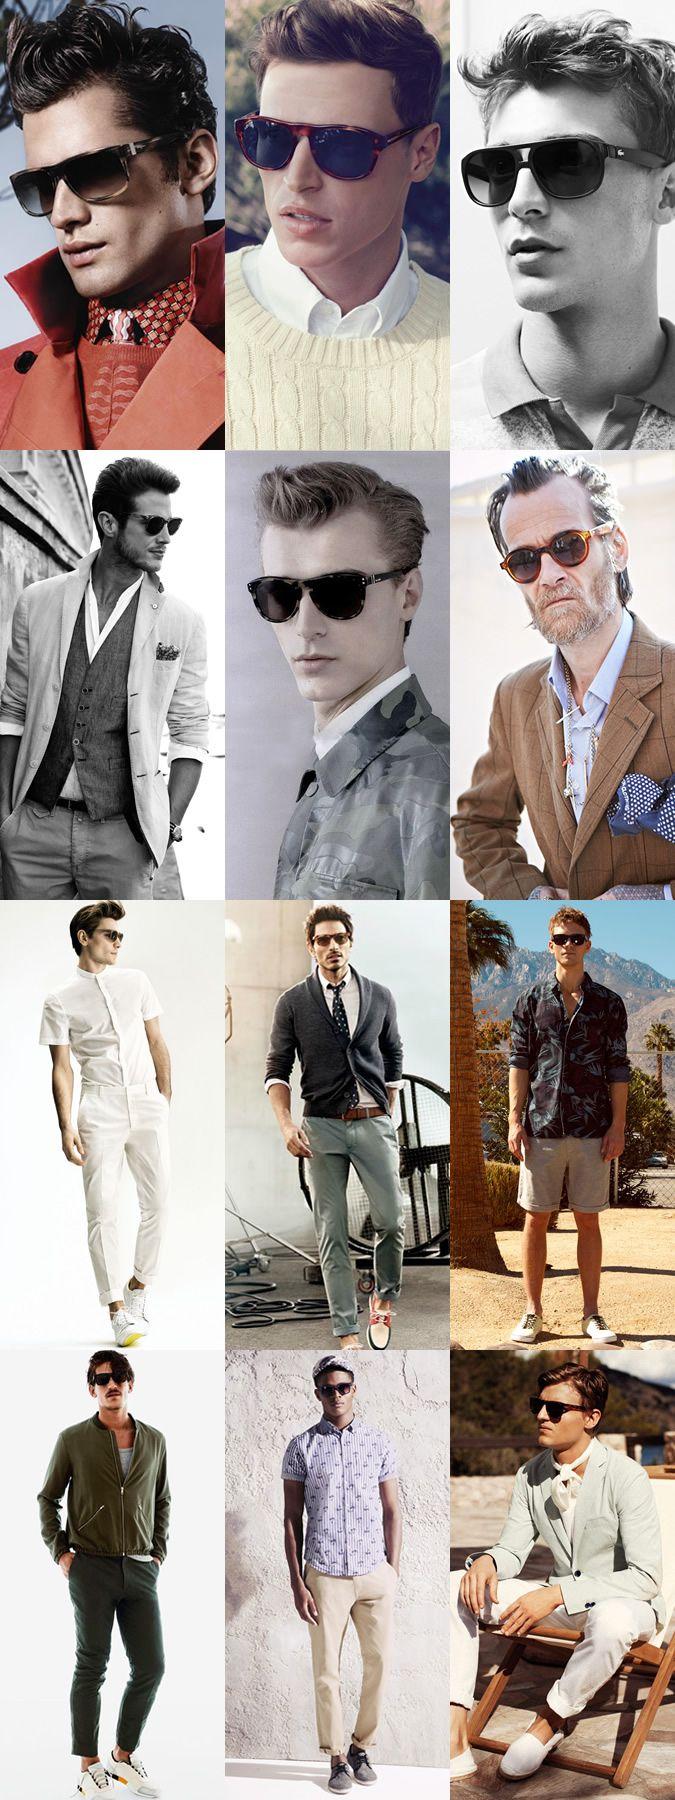 Sunglasses Lookbook Inspiration